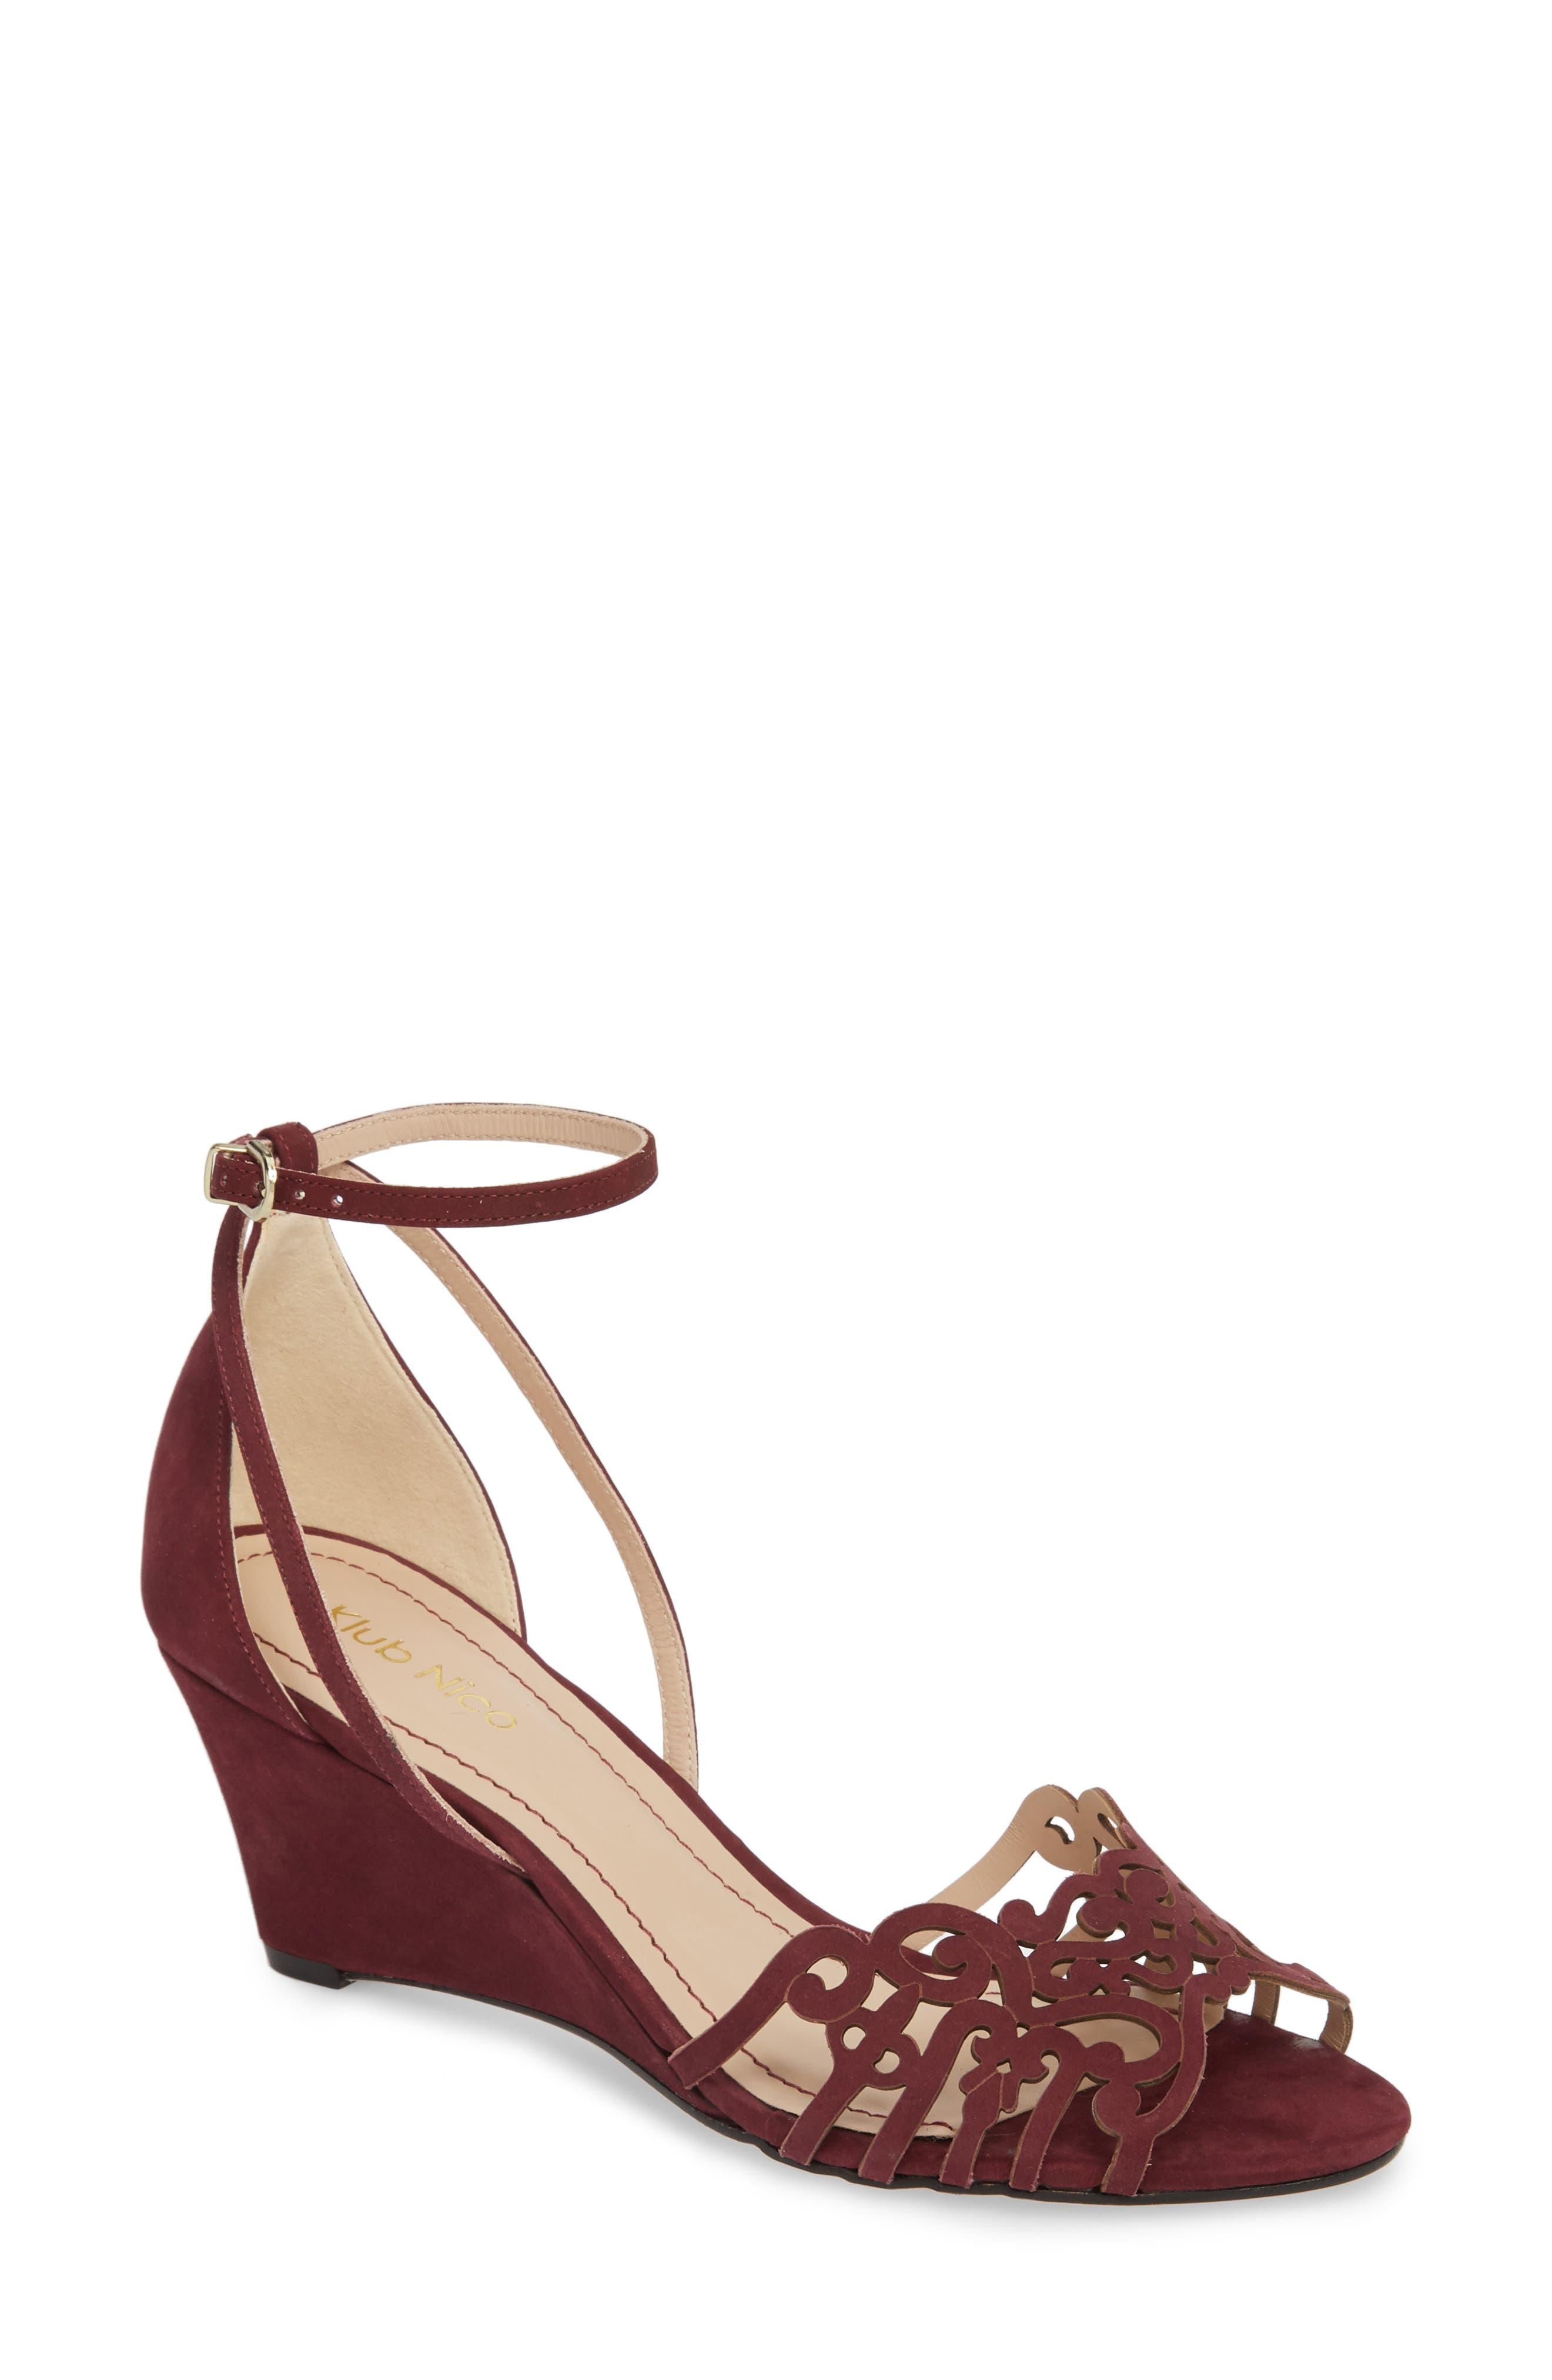 KLUB NICO, 'Kingston' Ankle Strap Wedge Sandal, Main thumbnail 1, color, WINE LEATHER